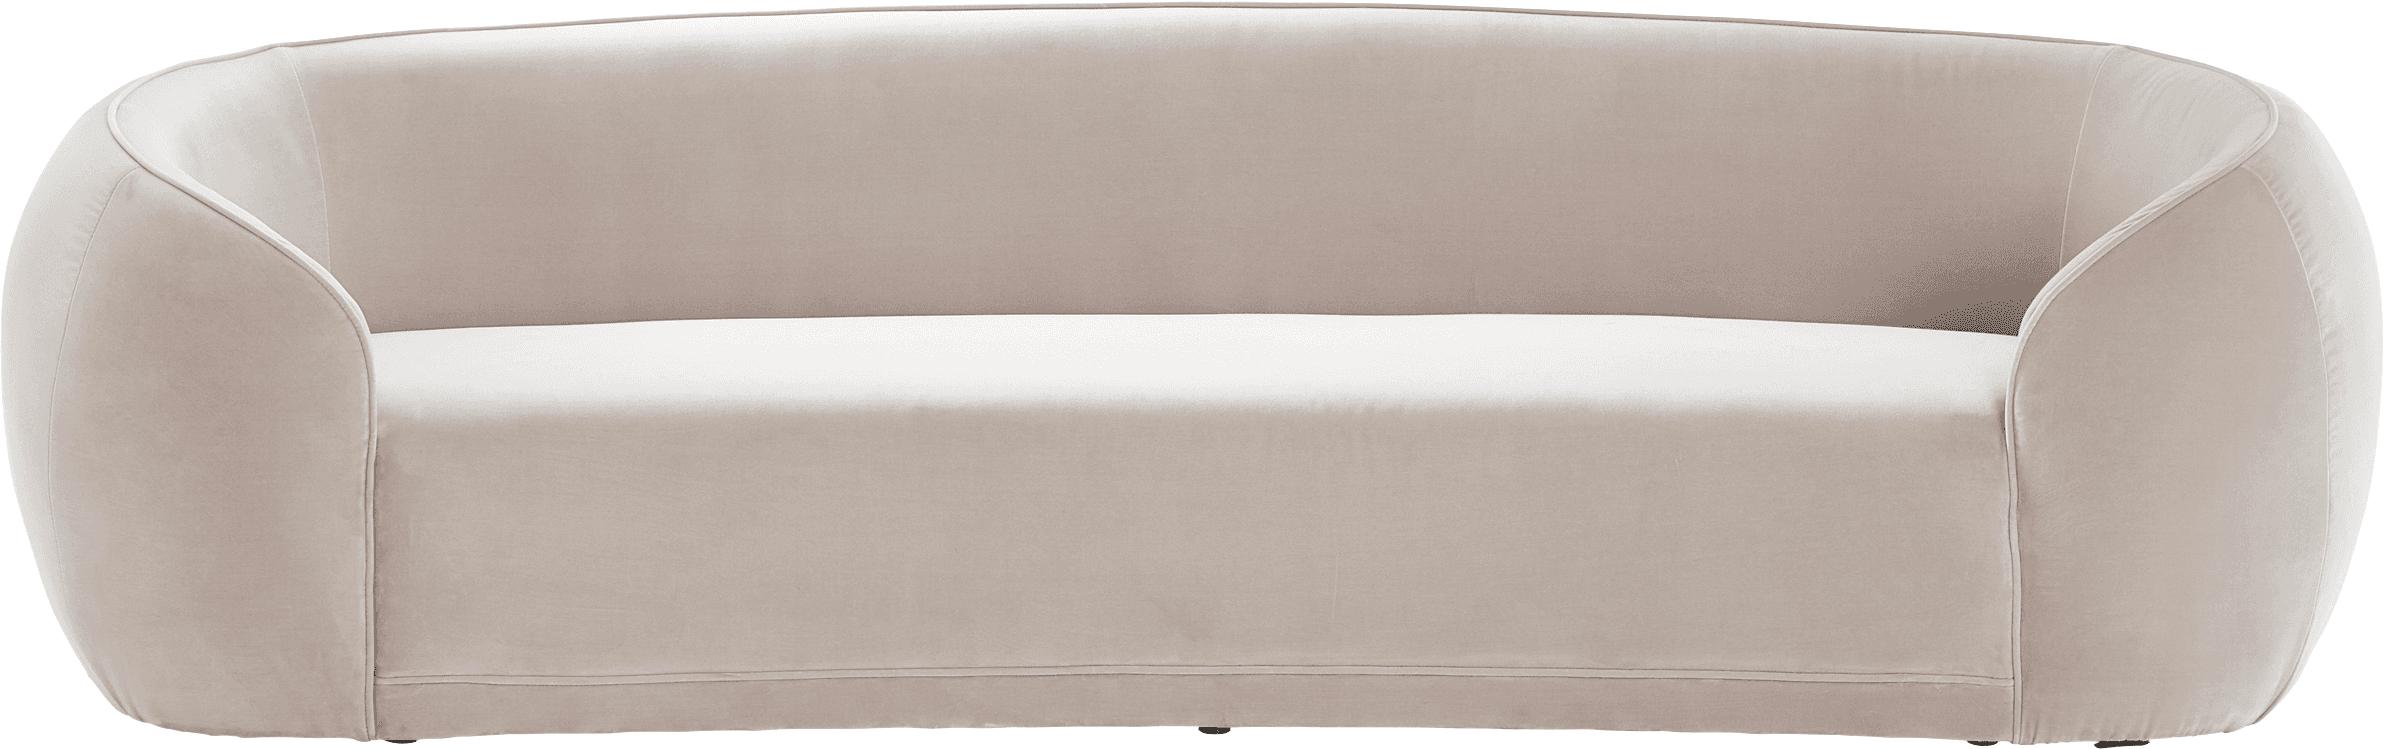 Samt-Sofa Austin (3-Sitzer), Bezug: 89% Baumwolle, 11% Polyes, Gestell: Kiefernholz, Samt Beige, B 232 x T 92 cm